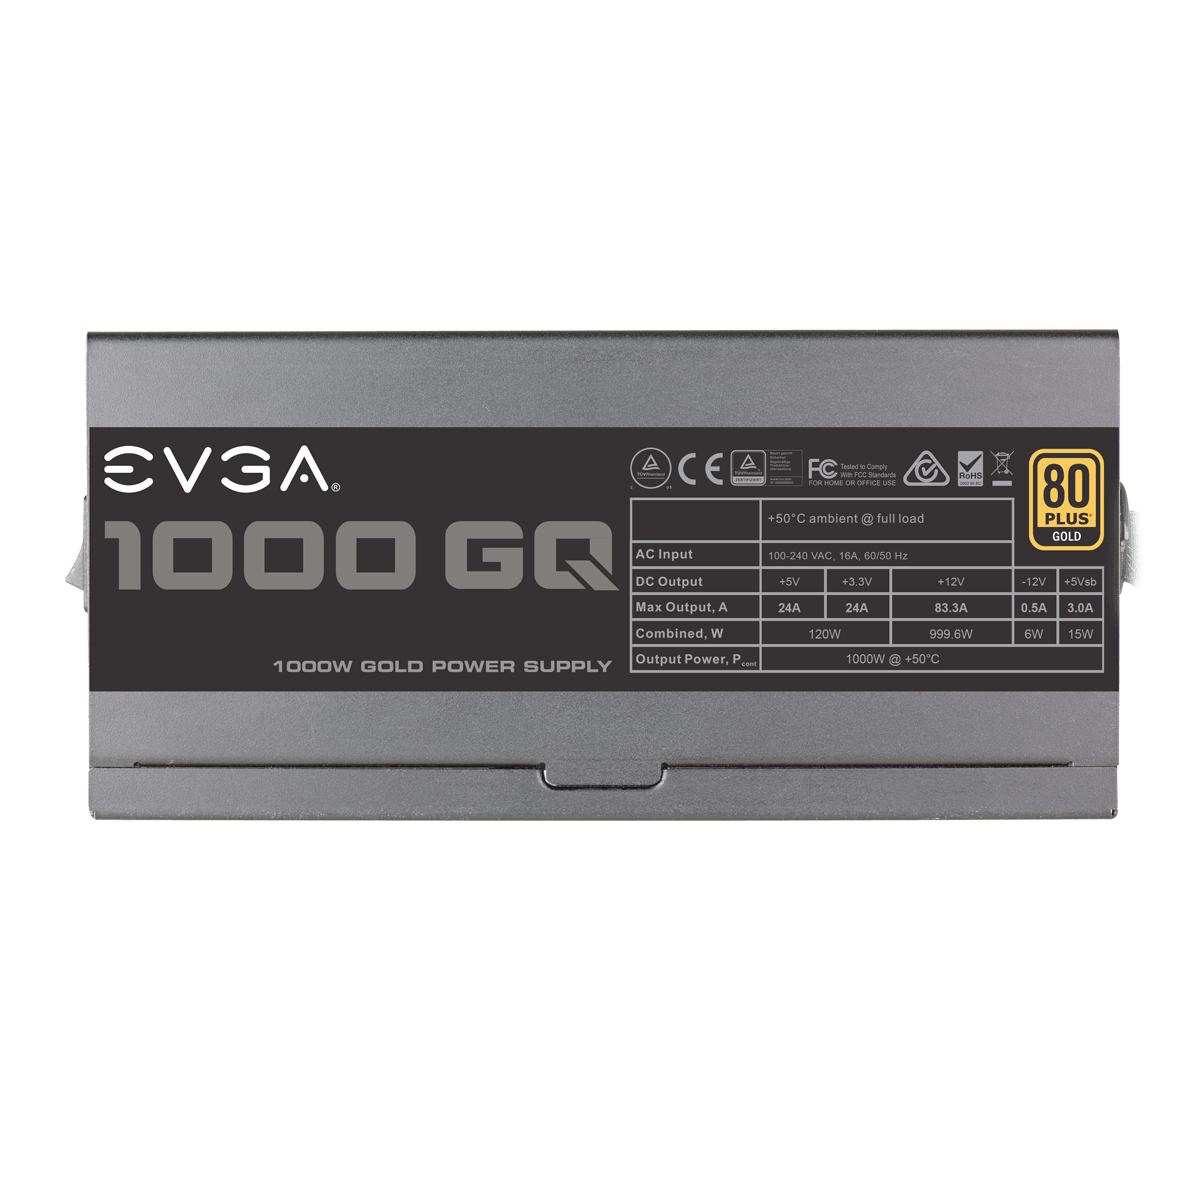 FUENTE REAL 1000W 80P GOLD GQ S. MODULAR- EVGA